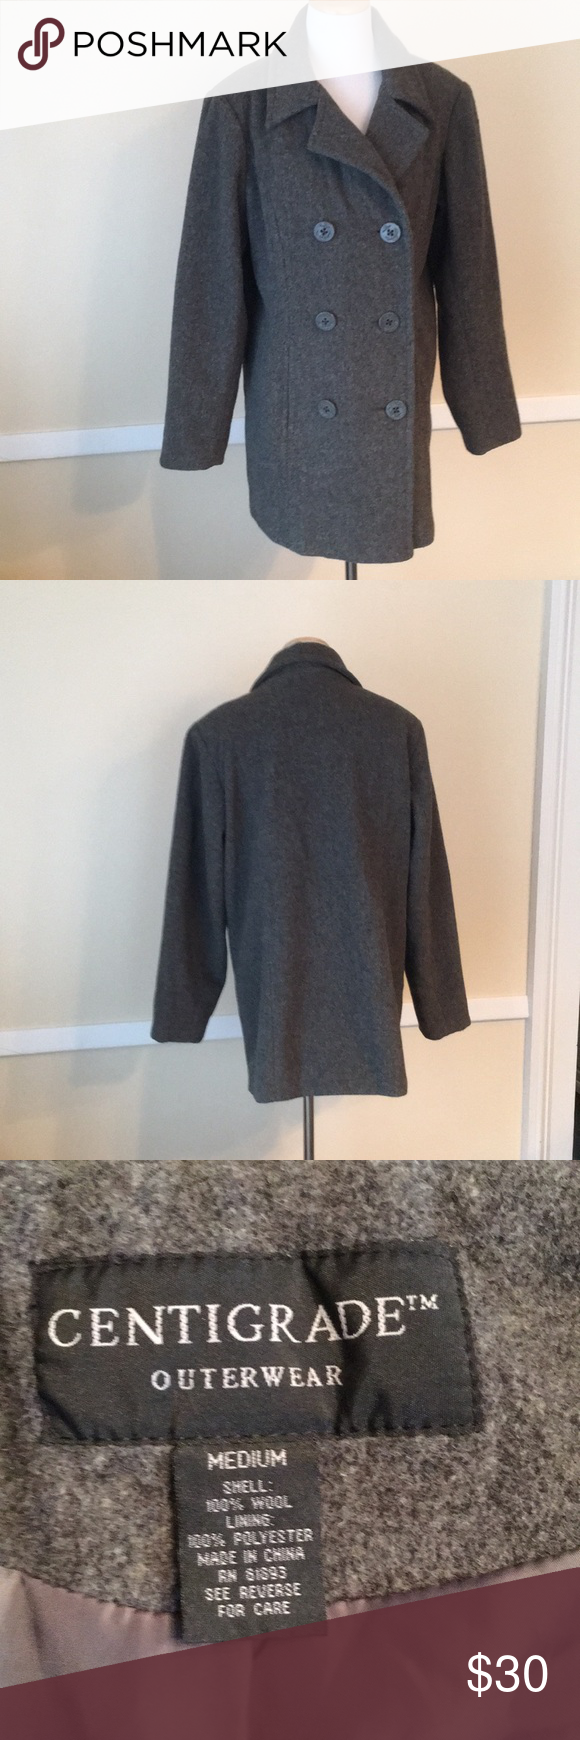 Centigrade Outerwear Ladies Wool Pea Coat In Med Wool Peacoat Winter Pea Coat Outerwear [ 1740 x 580 Pixel ]